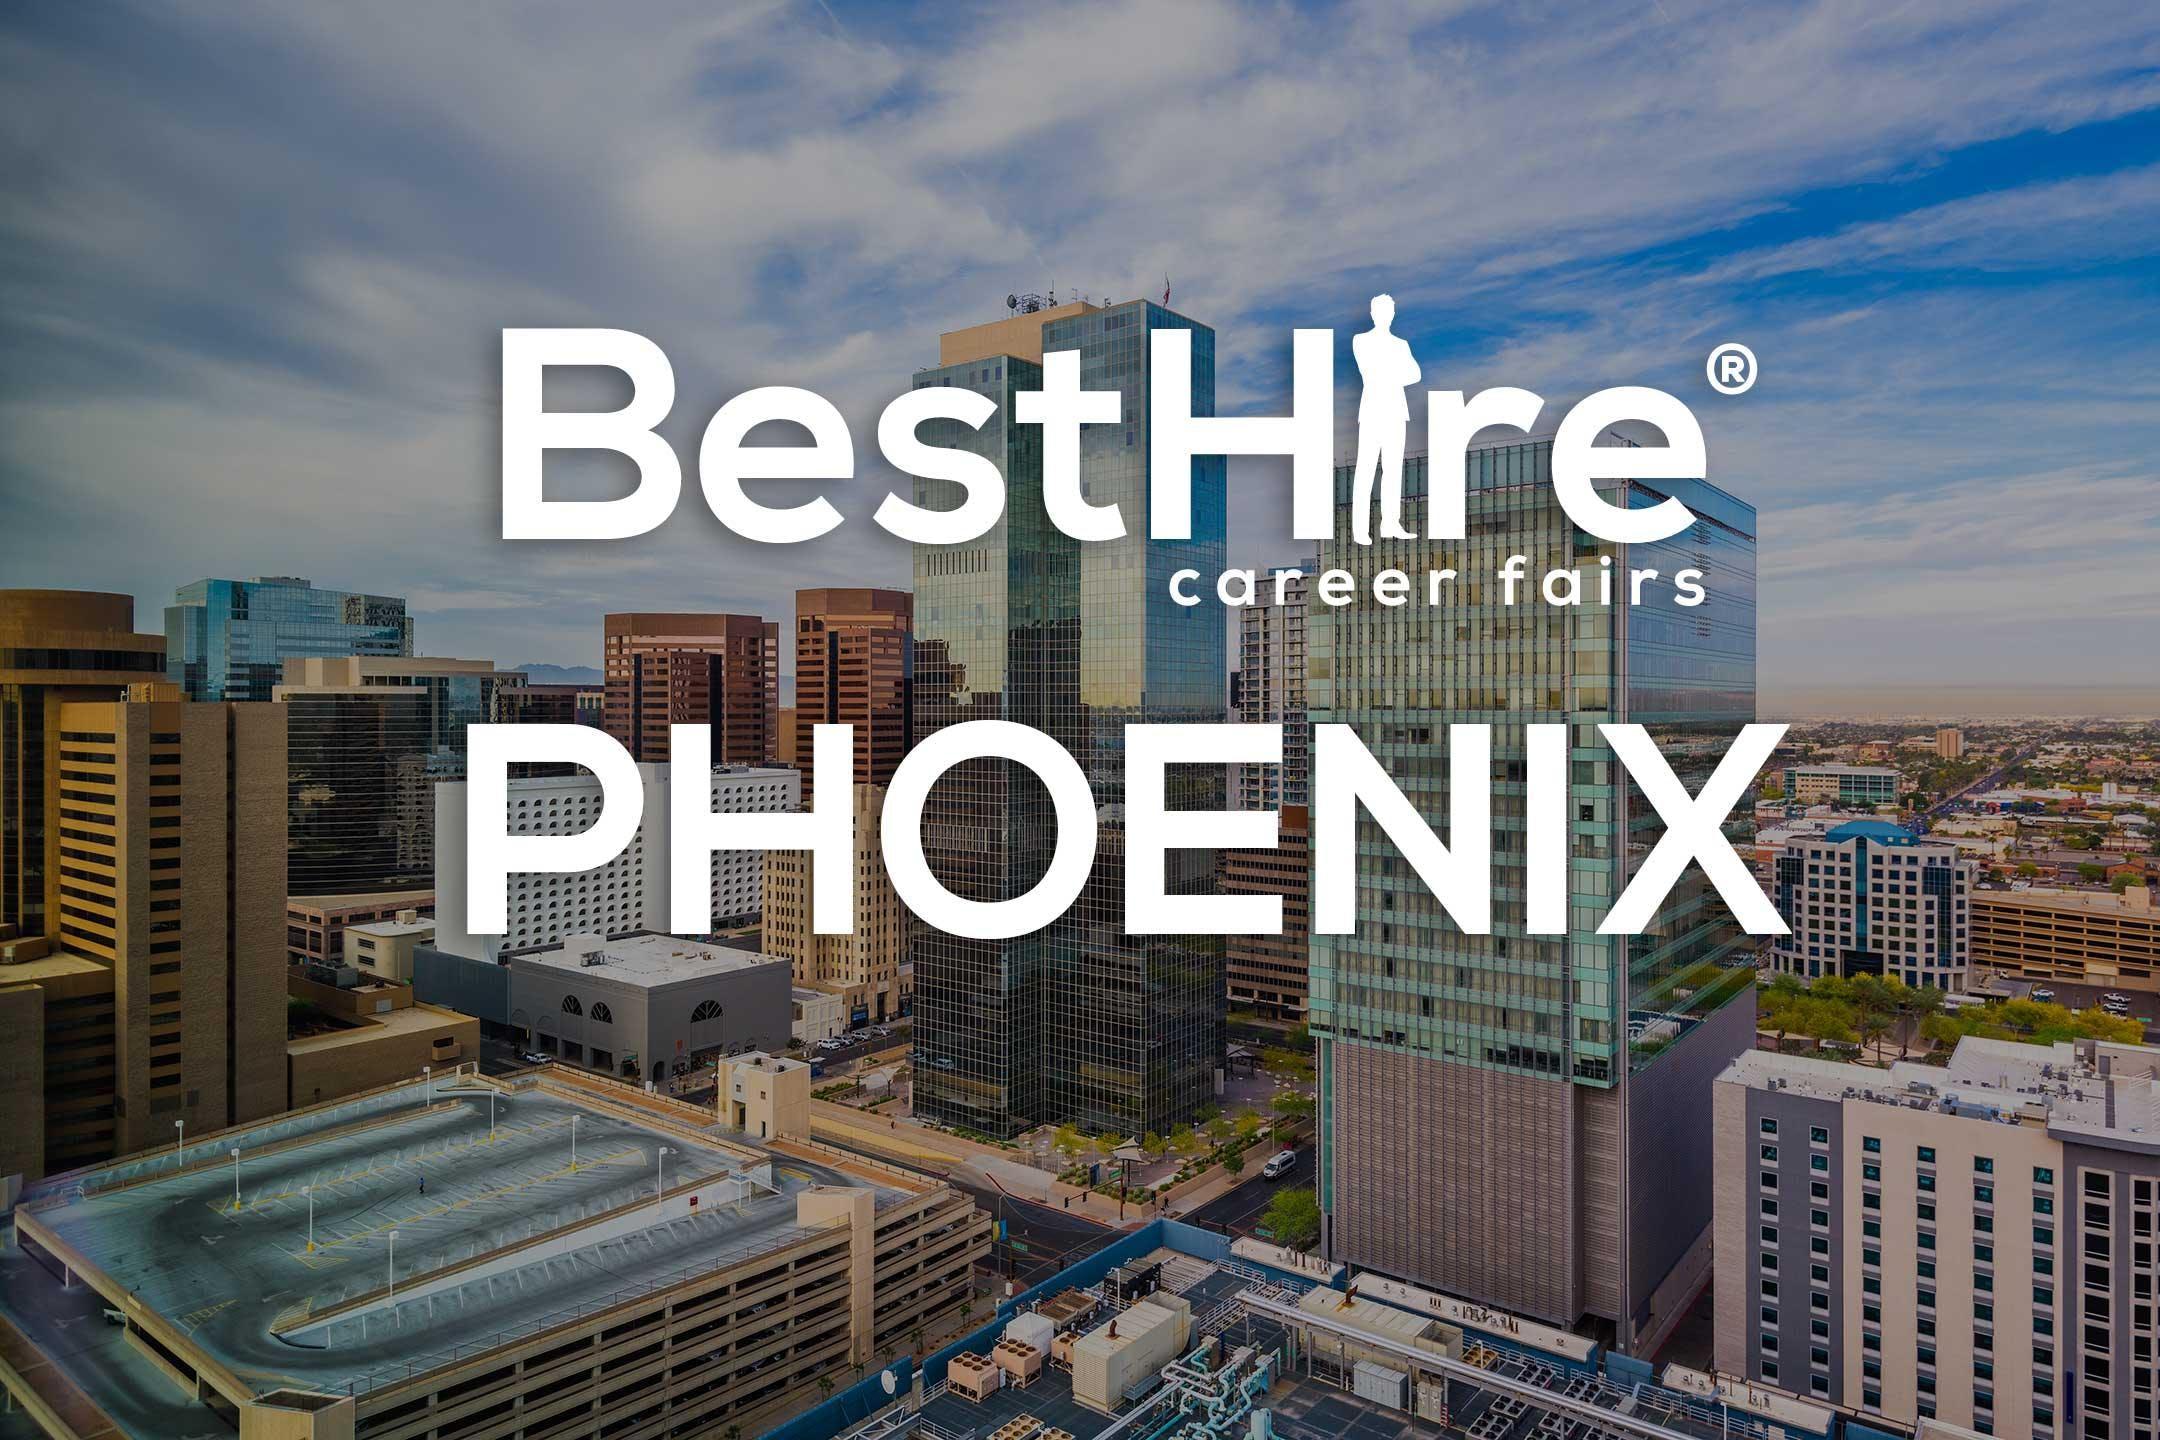 Phoenix Job Fair - Get Hired in Phoenix Arizona